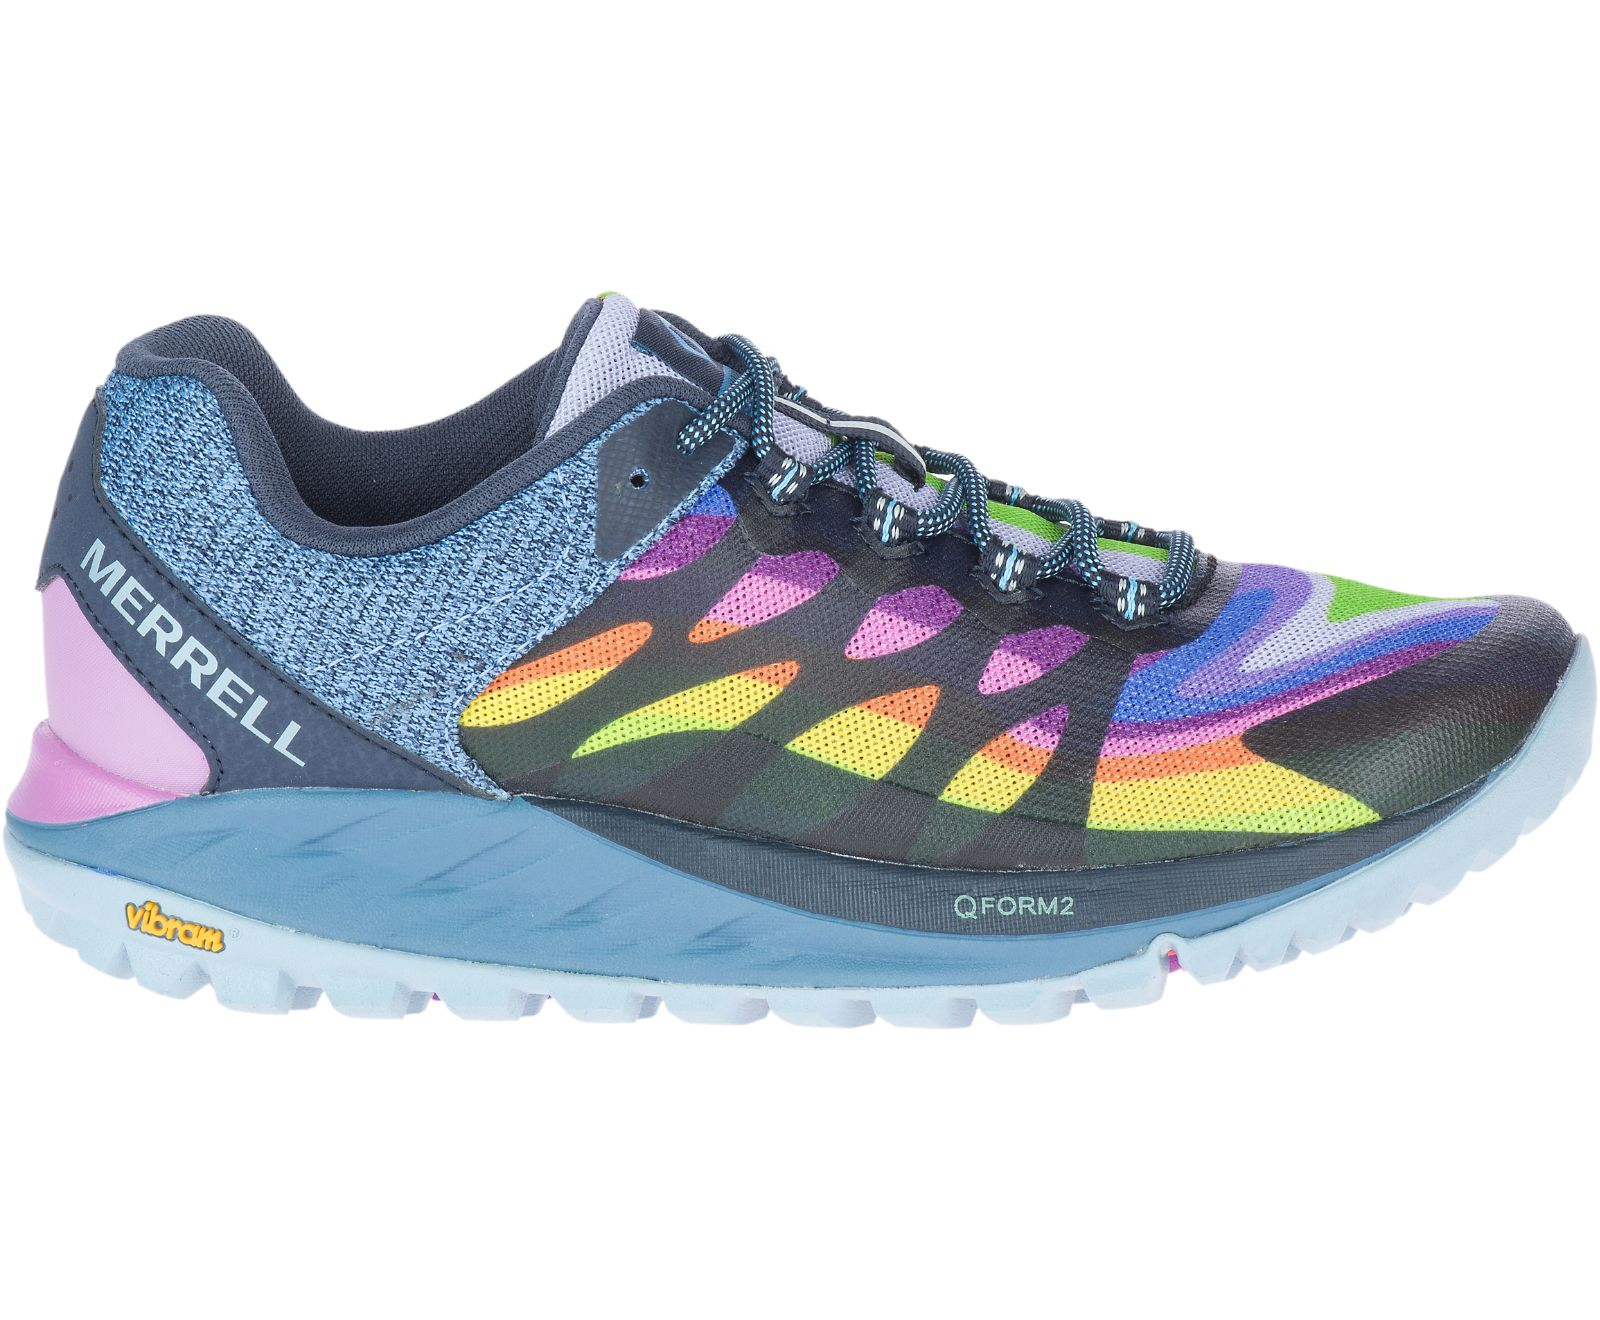 Women's Antora 2 Rainbow, $110 @merrell.com